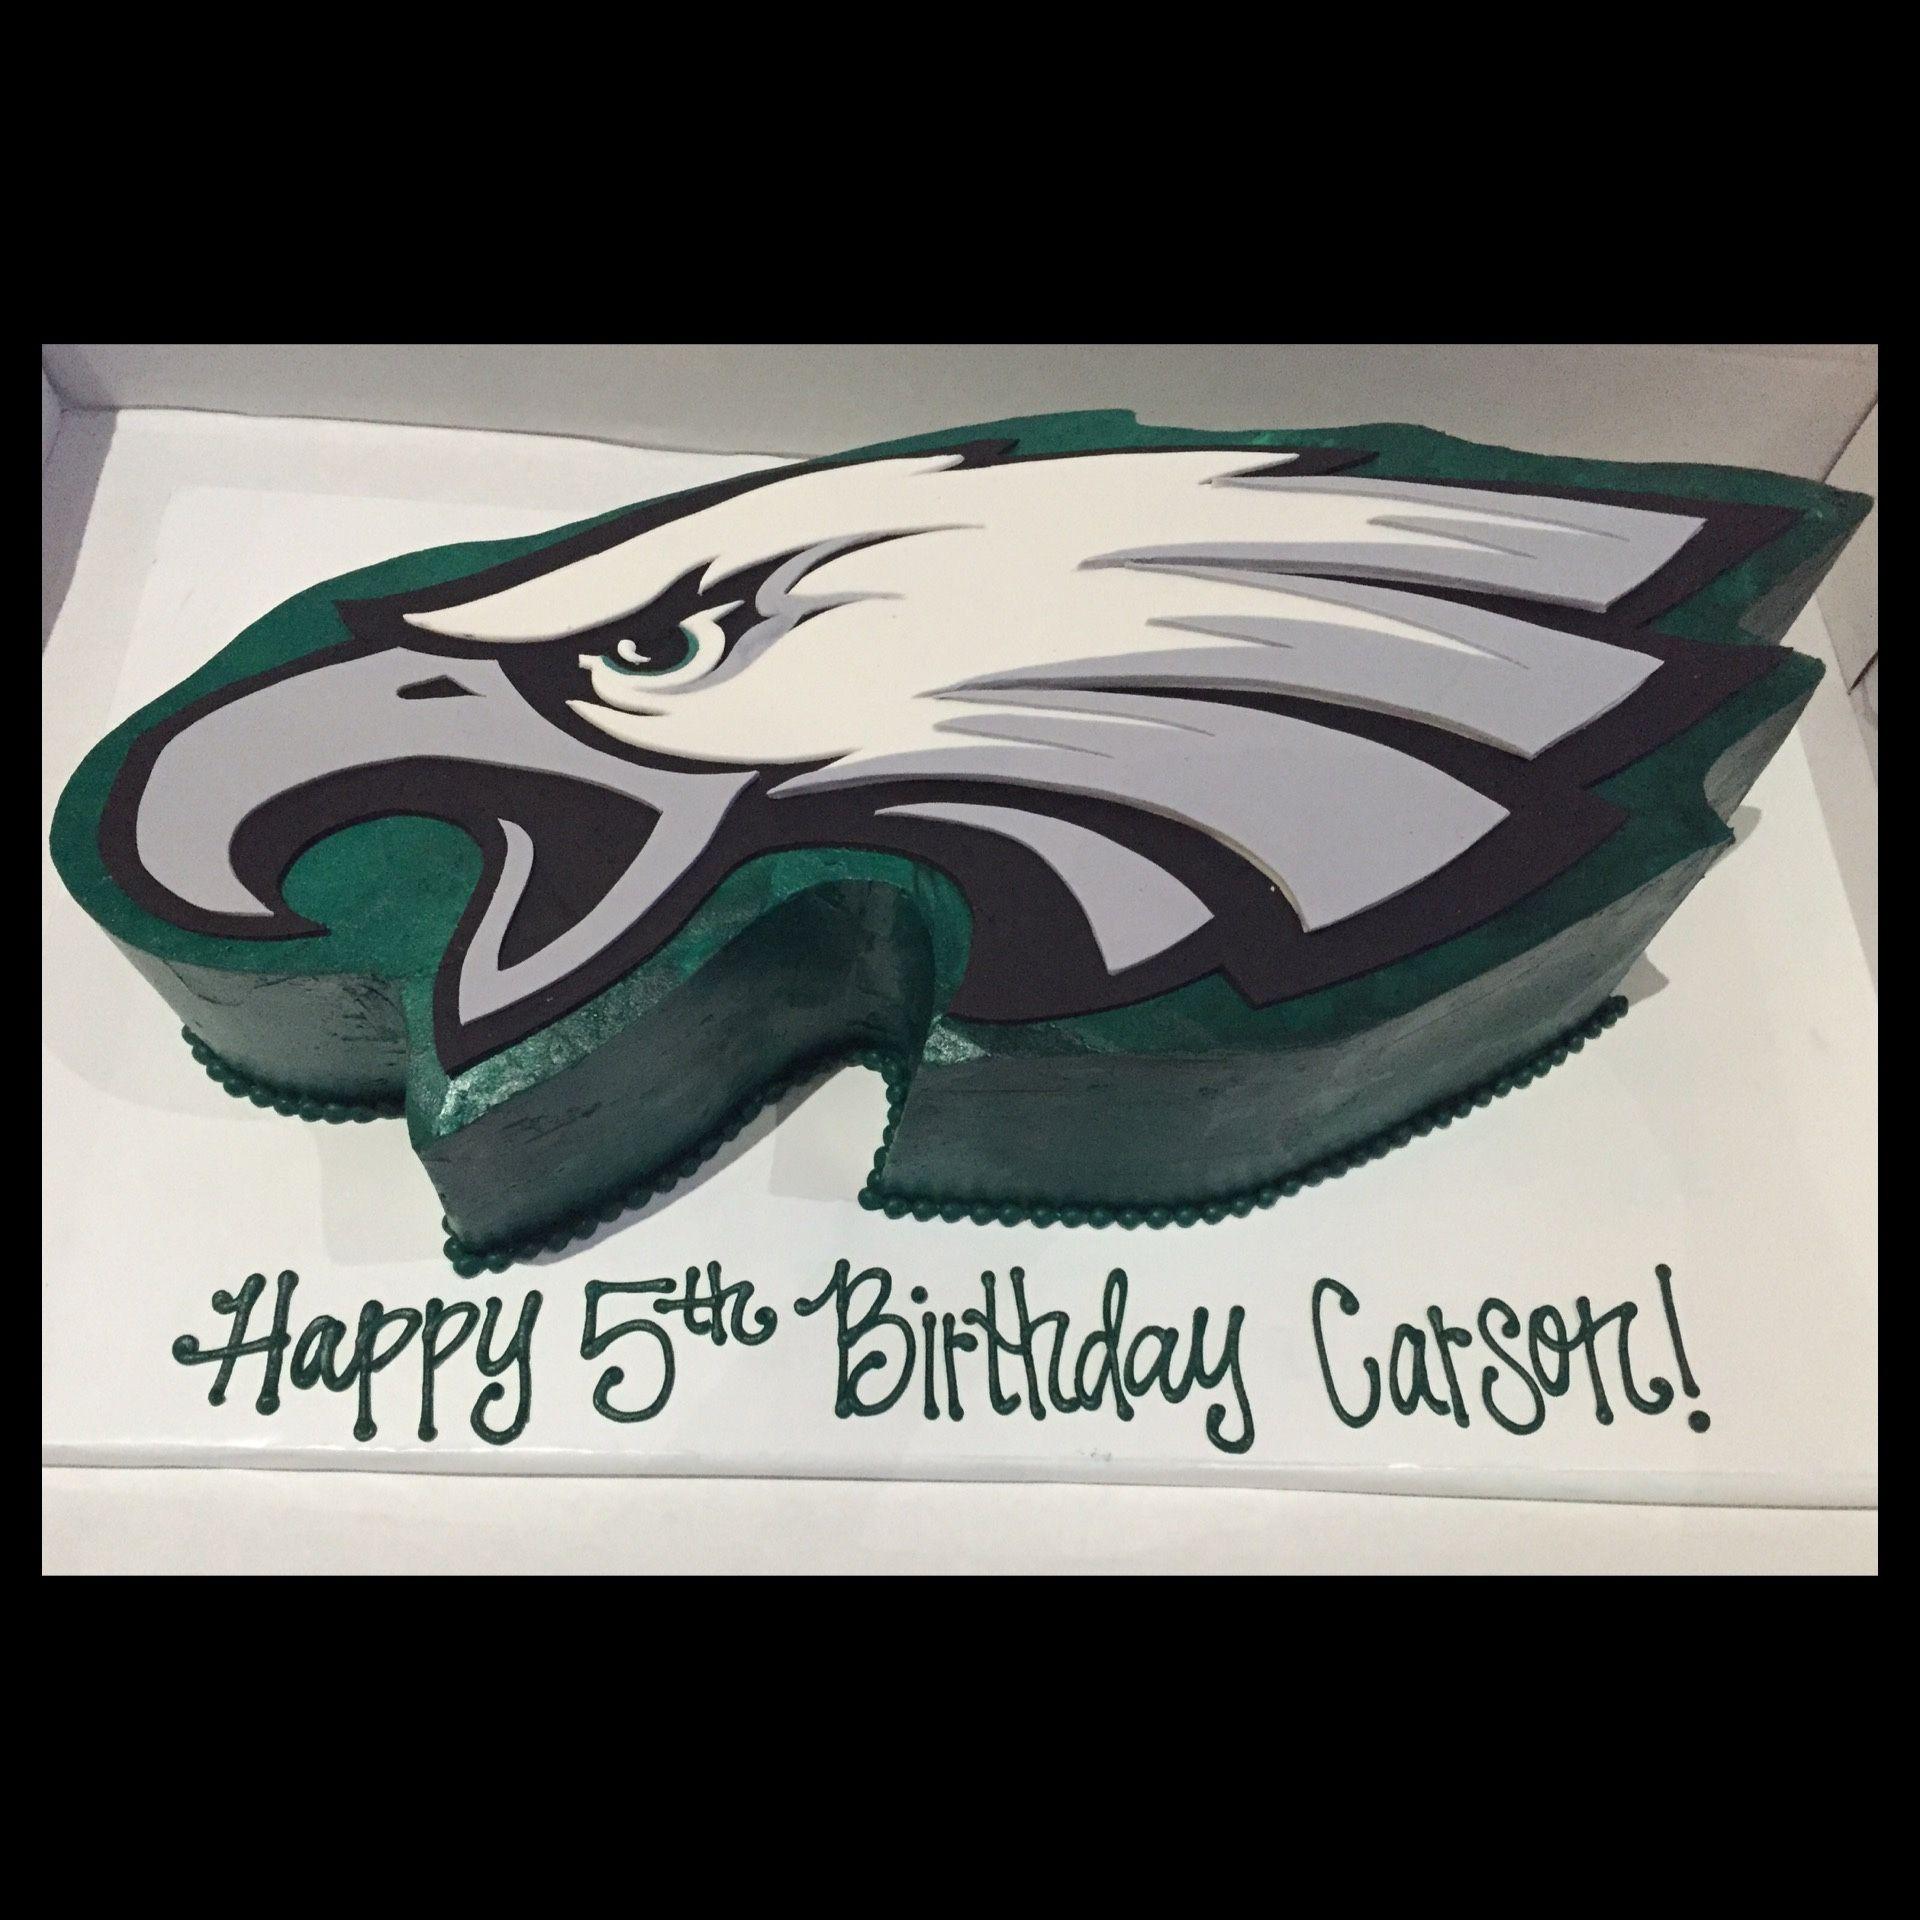 My big guys Philadelphia Eagles themed birthday cake by Sweet